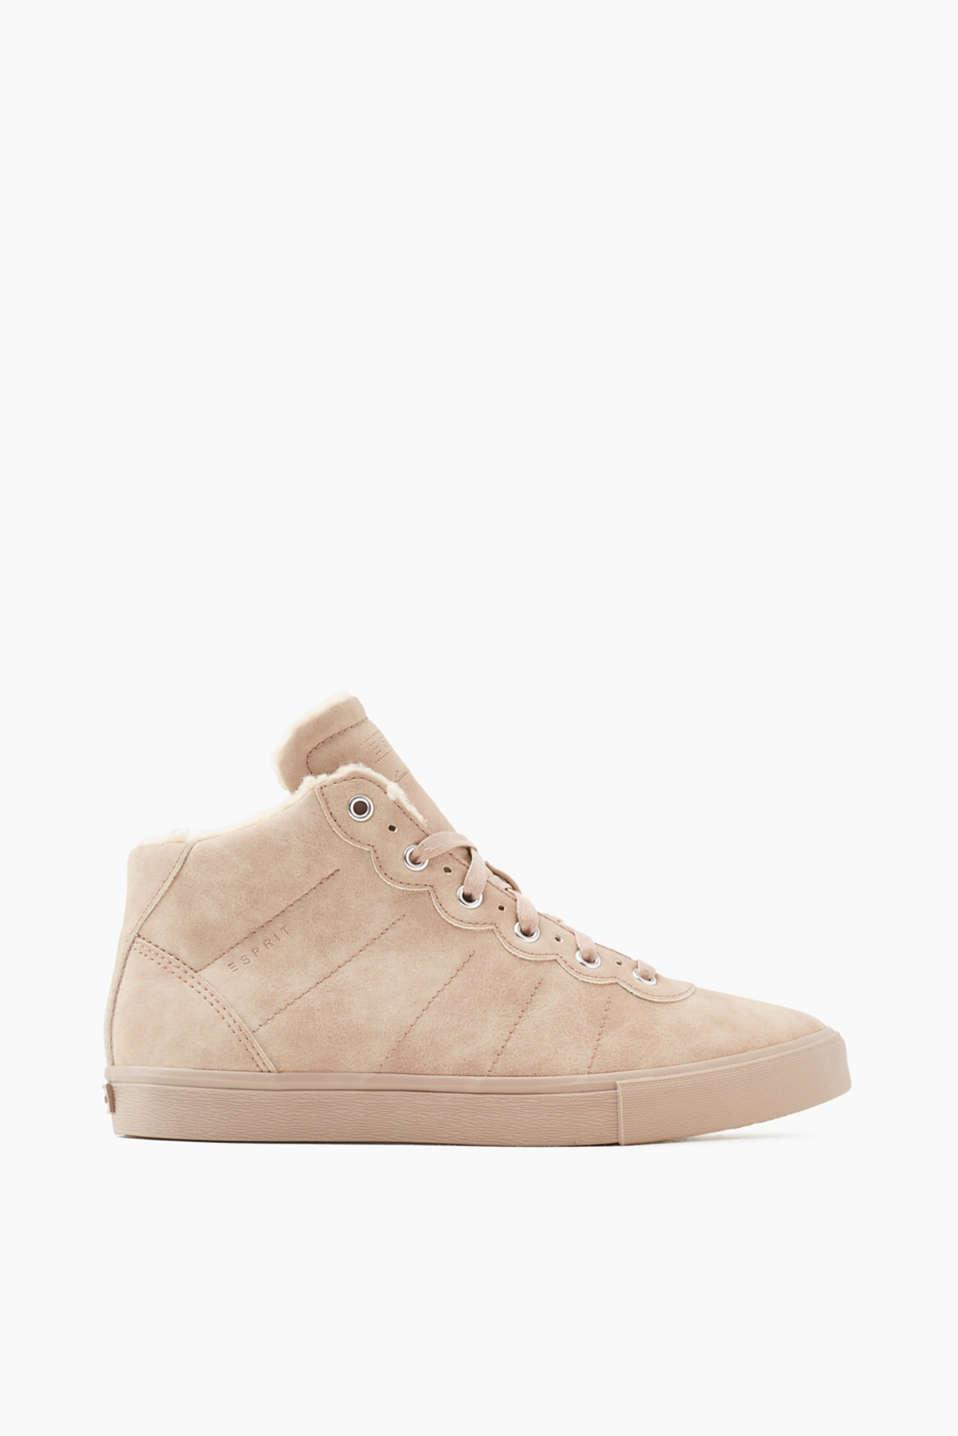 Esprit sneakers montantes vegan acheter sur la - Chaussures vegan esprit ...